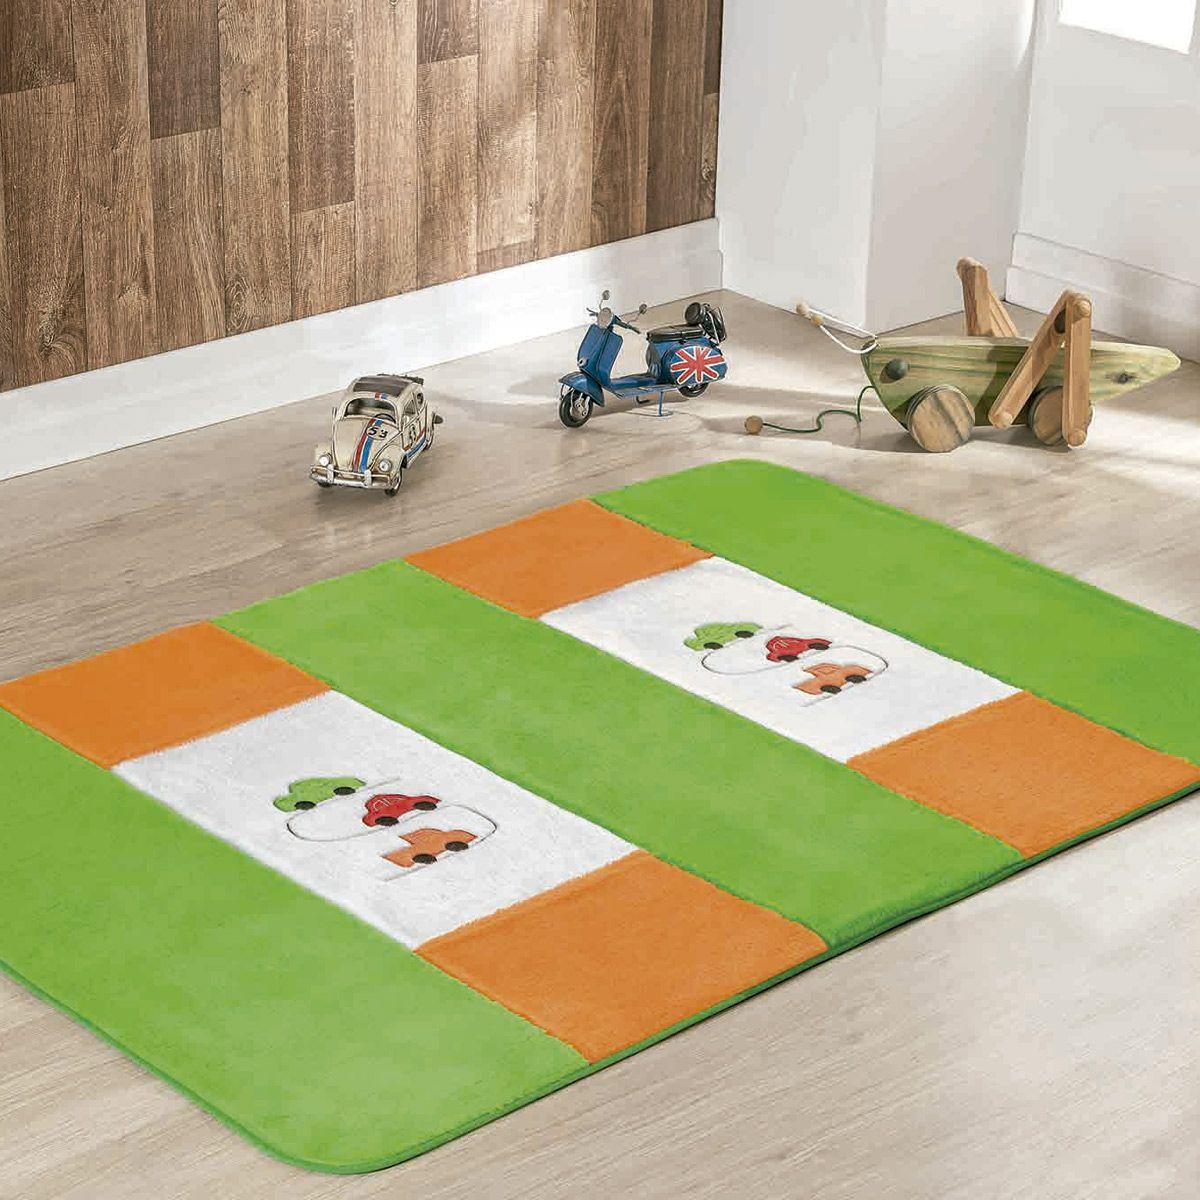 Passadeira Infantil Premium Carrinhos Verde Pistache 1,20m x 74cm